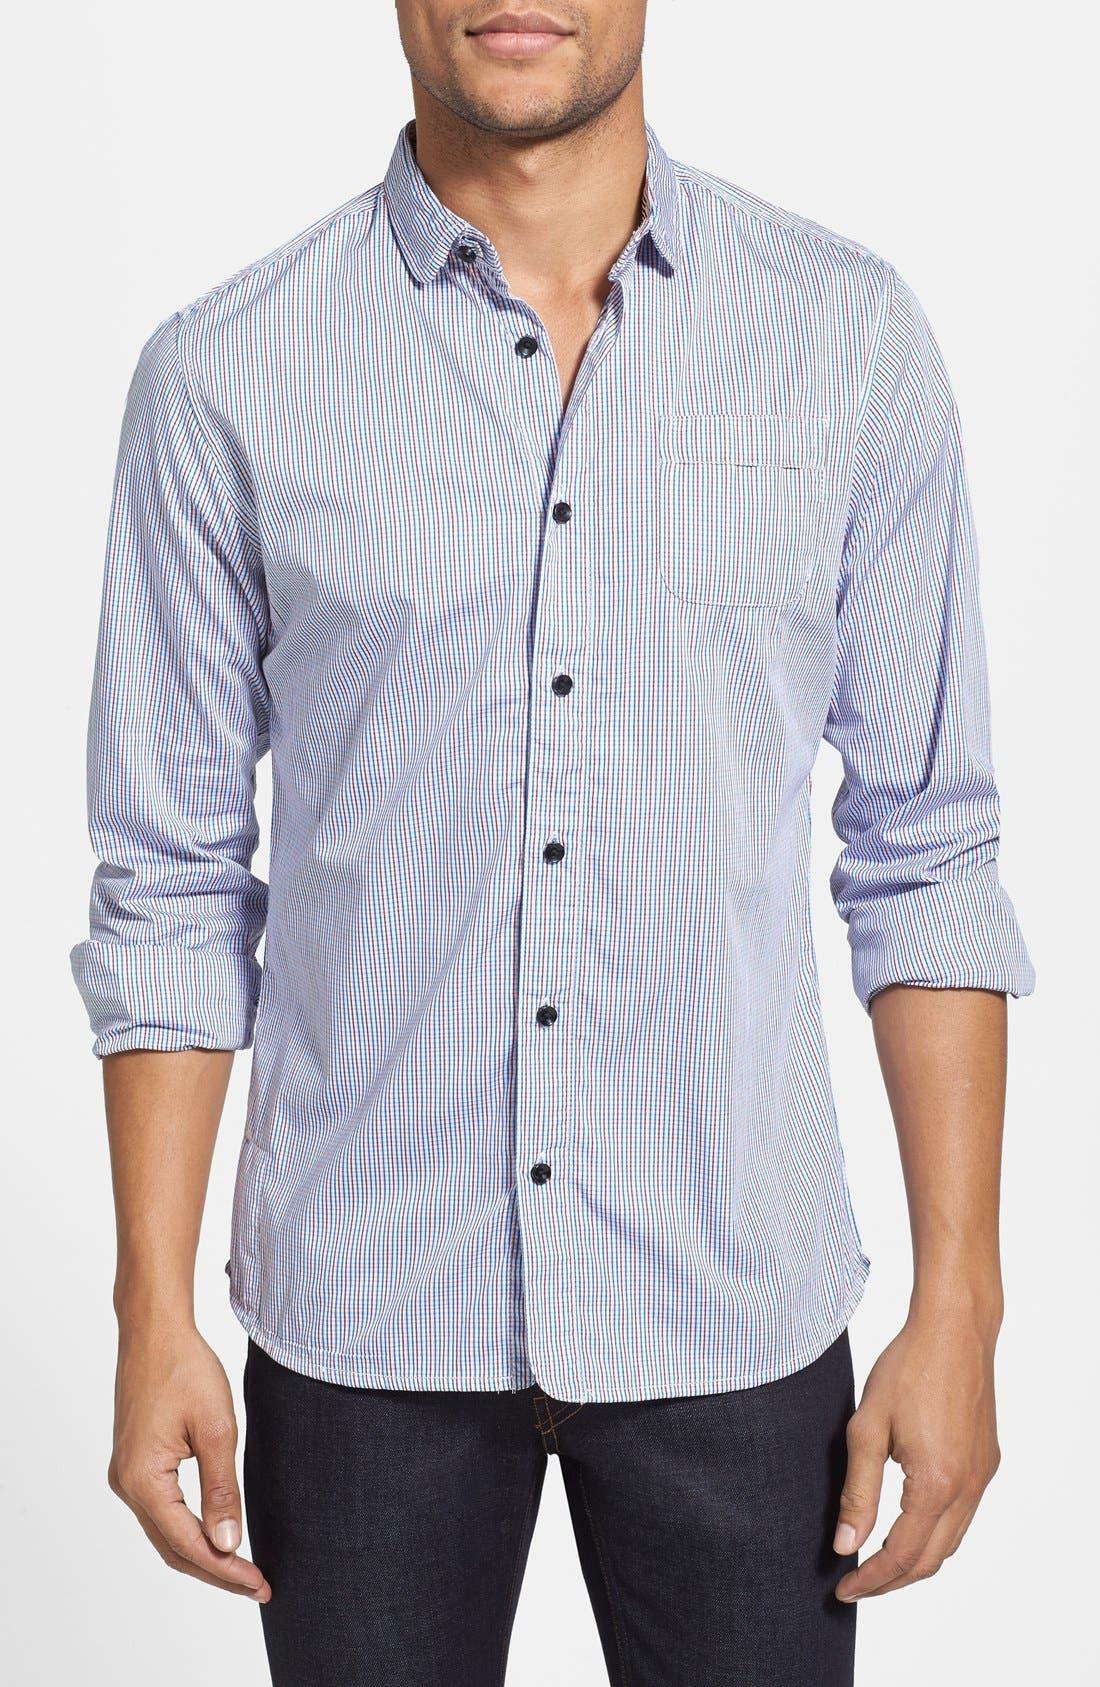 Main Image - Descendant of Thieves Slim Fit Multi Check Shirt